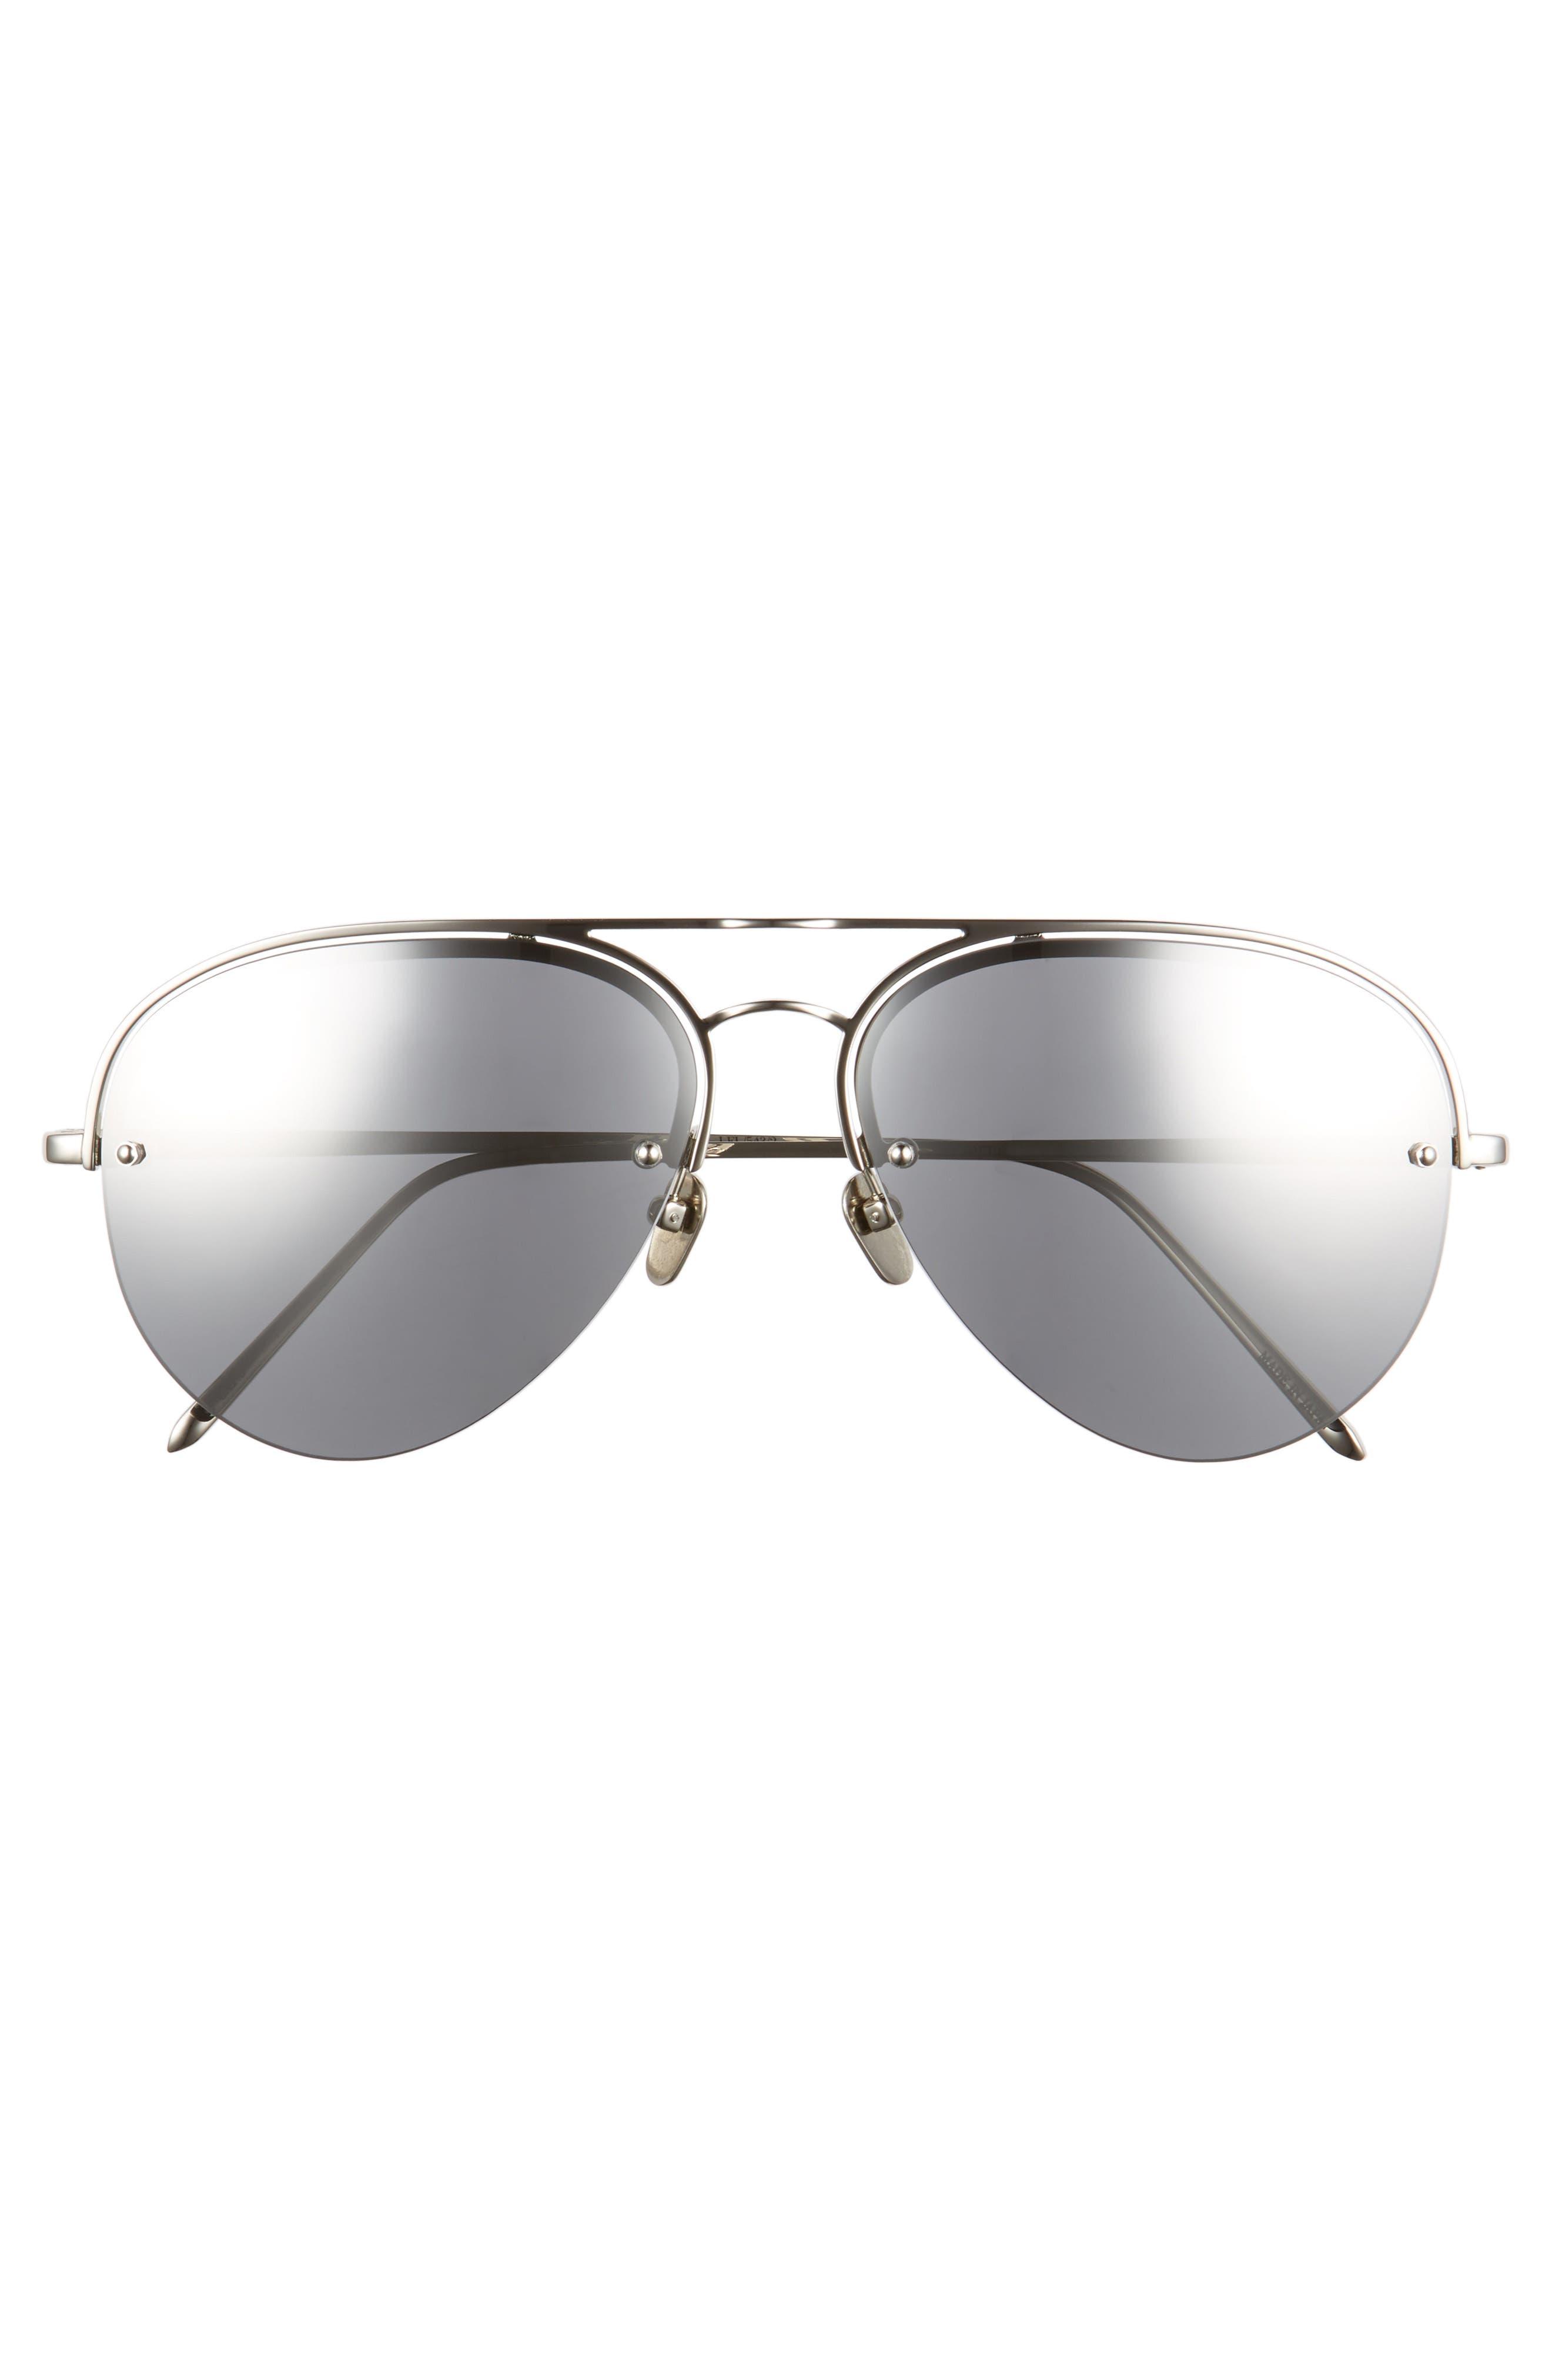 60mm Mirrored 18 Karat Gold Aviator Sunglasses,                             Alternate thumbnail 3, color,                             White Gold/ Platinum